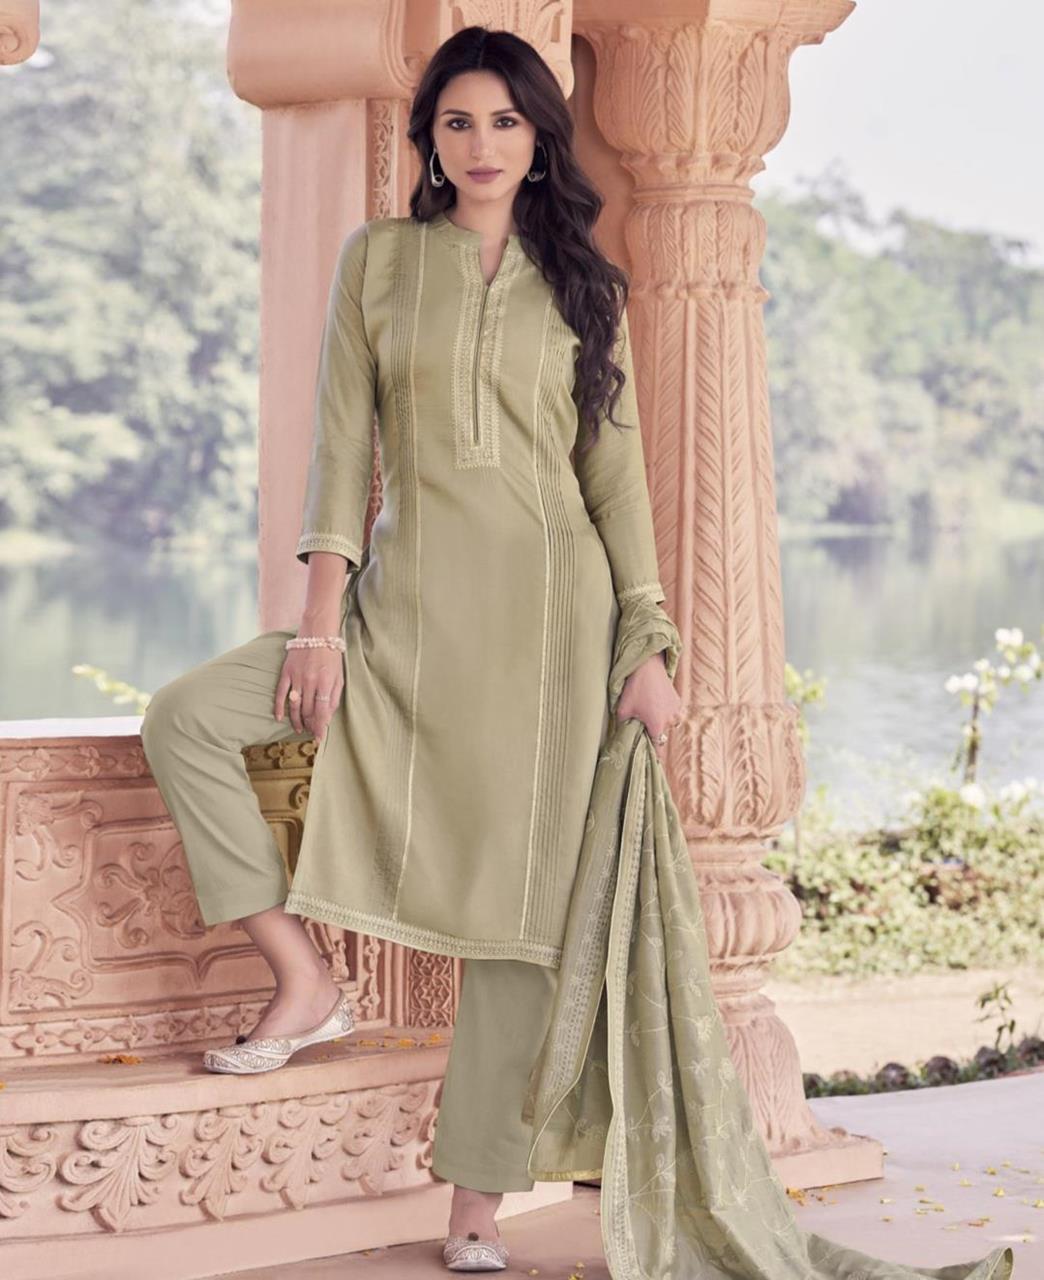 Zari Cotton Straight cut Salwar Kameez in Beige